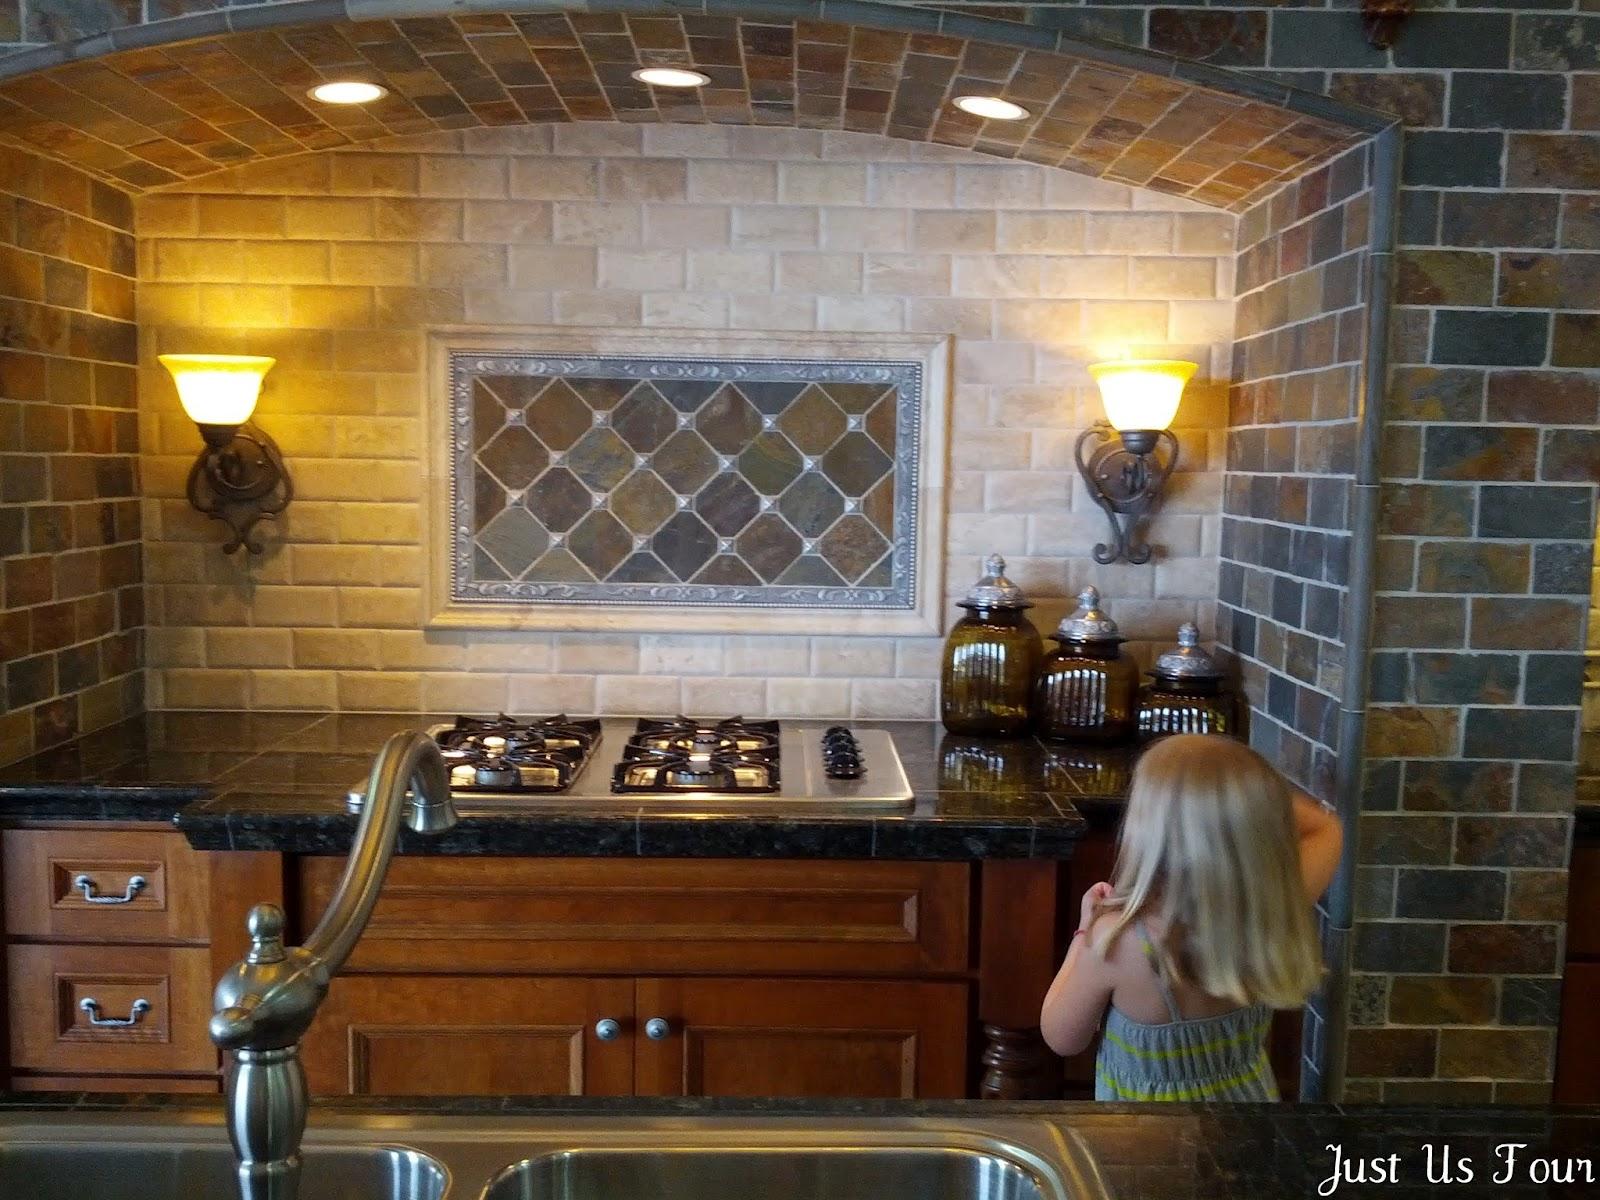 Basement Reno: Come Tile Away - Just Us Four